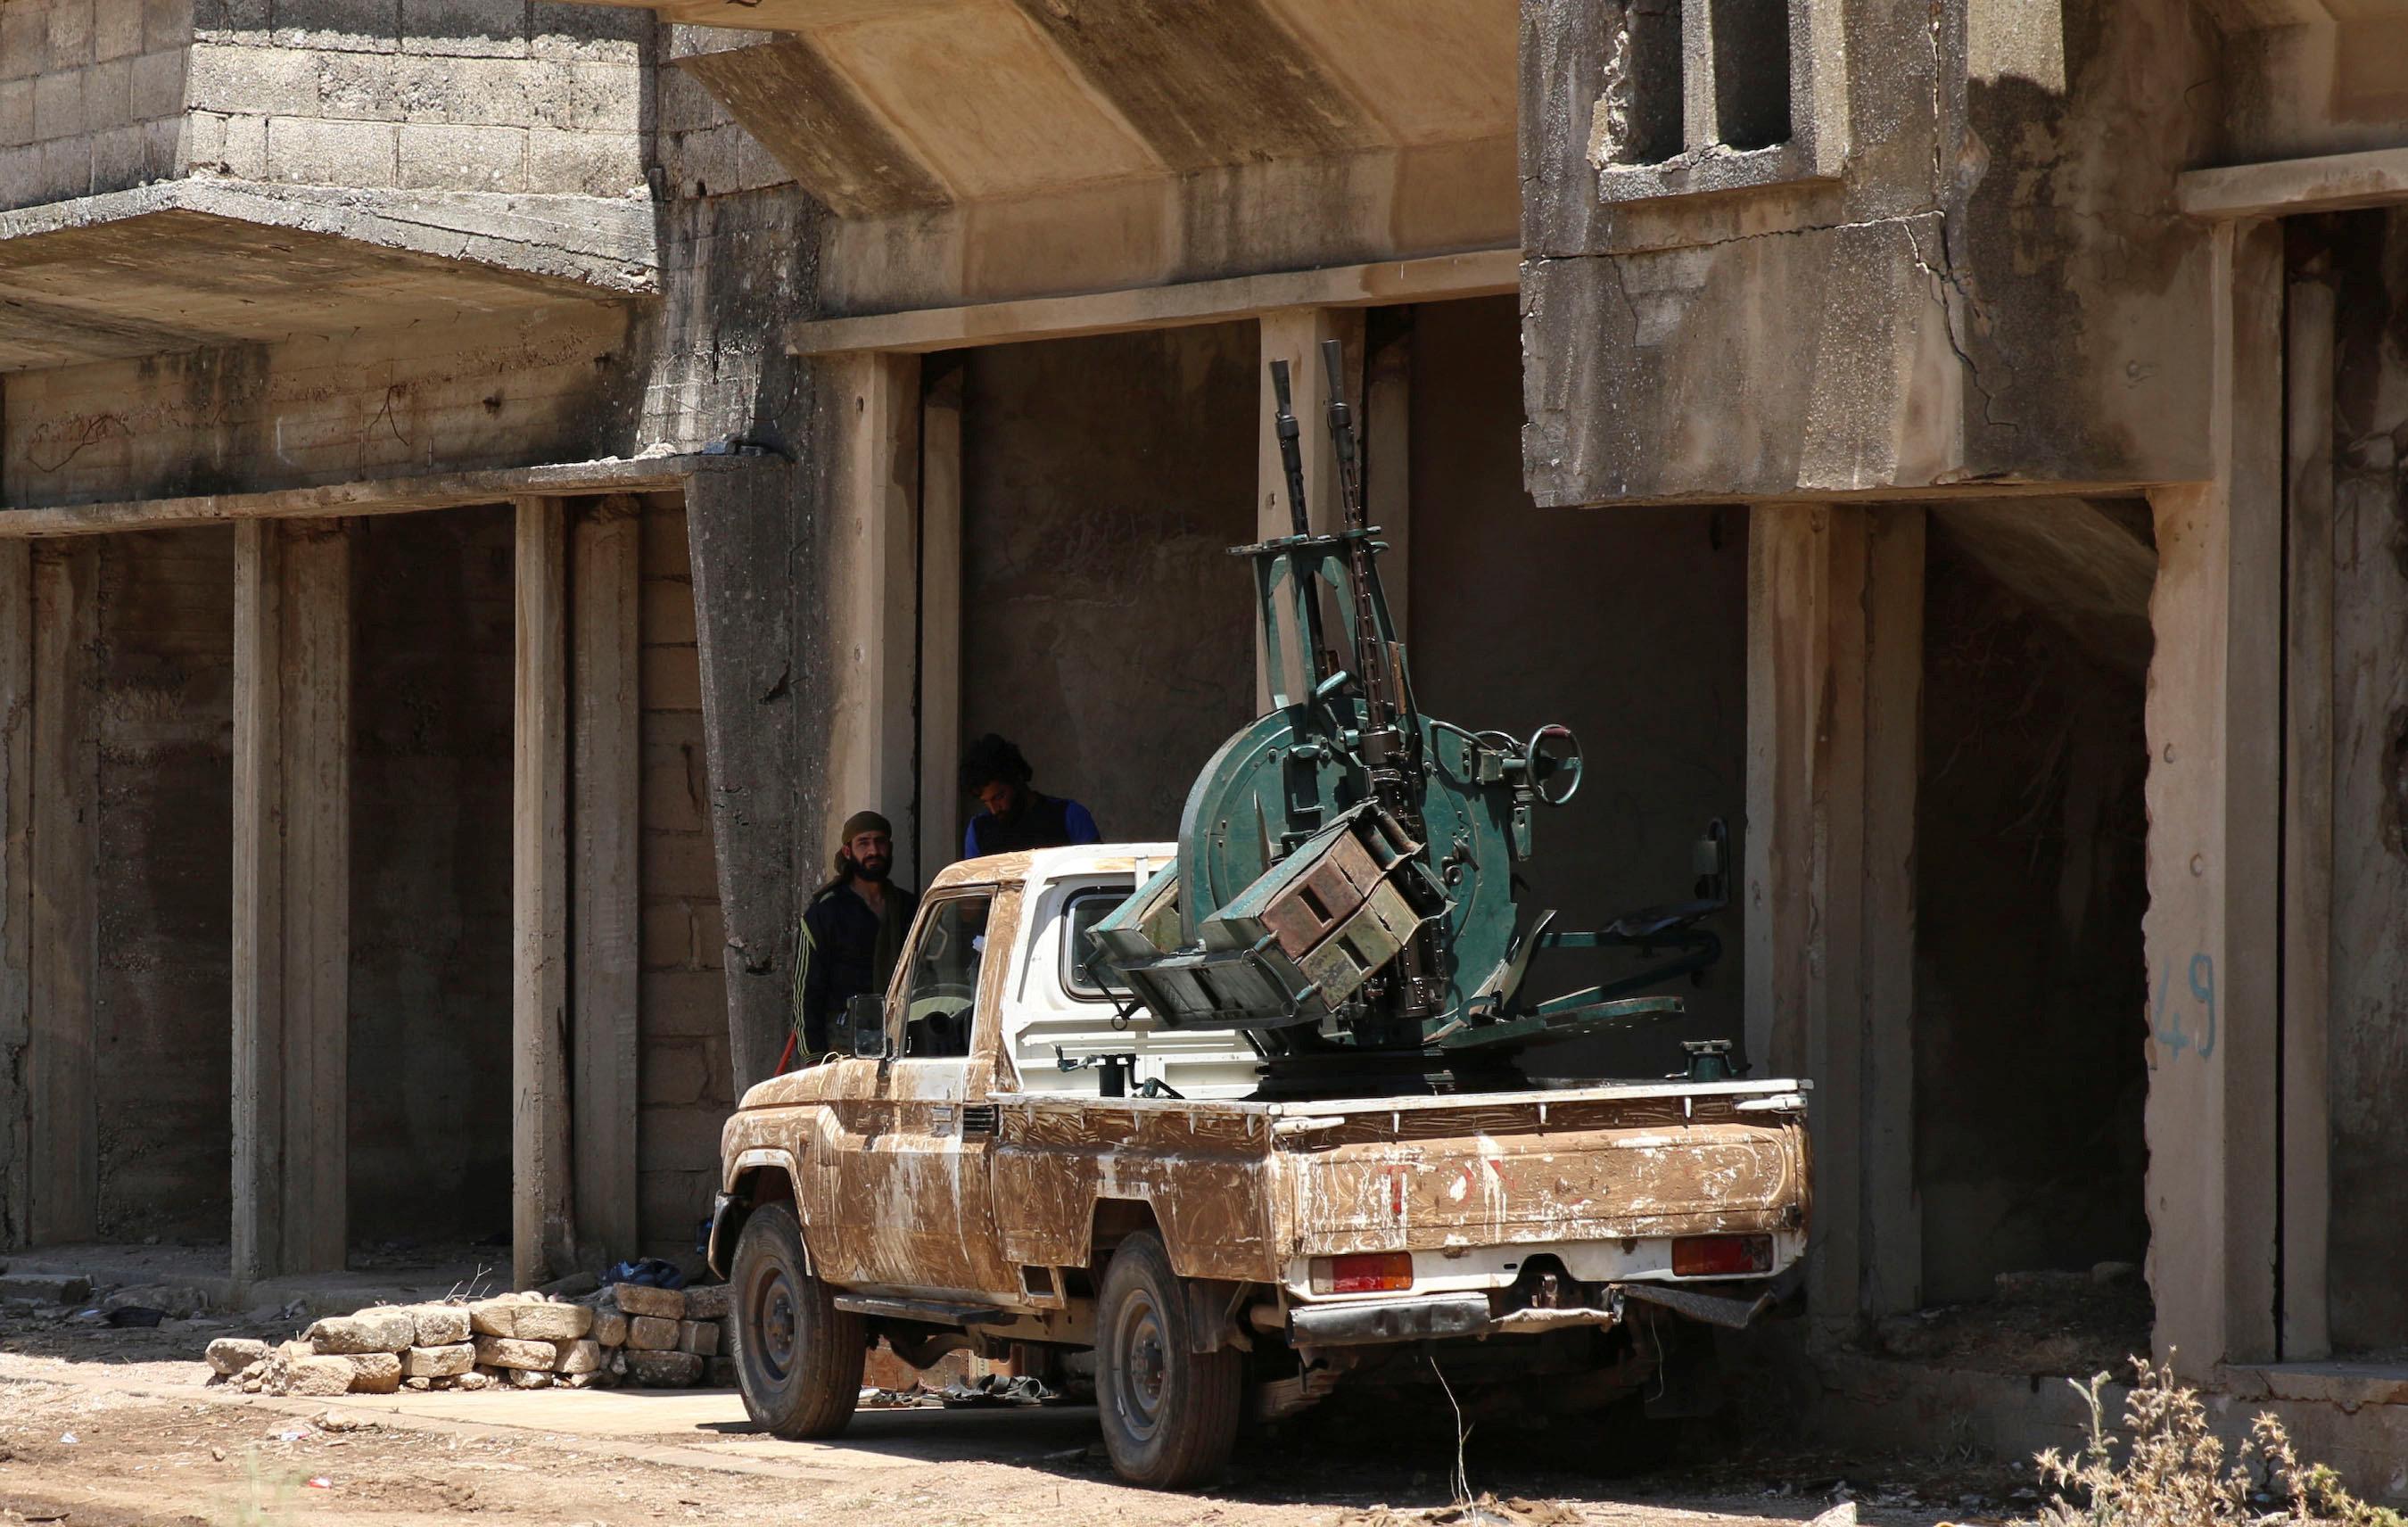 Free Syrian Army fighter stand near an anti-air craft machine gun in Quneitra, Syria July 8, 2017. REUTERS/Alaa al-Faqir